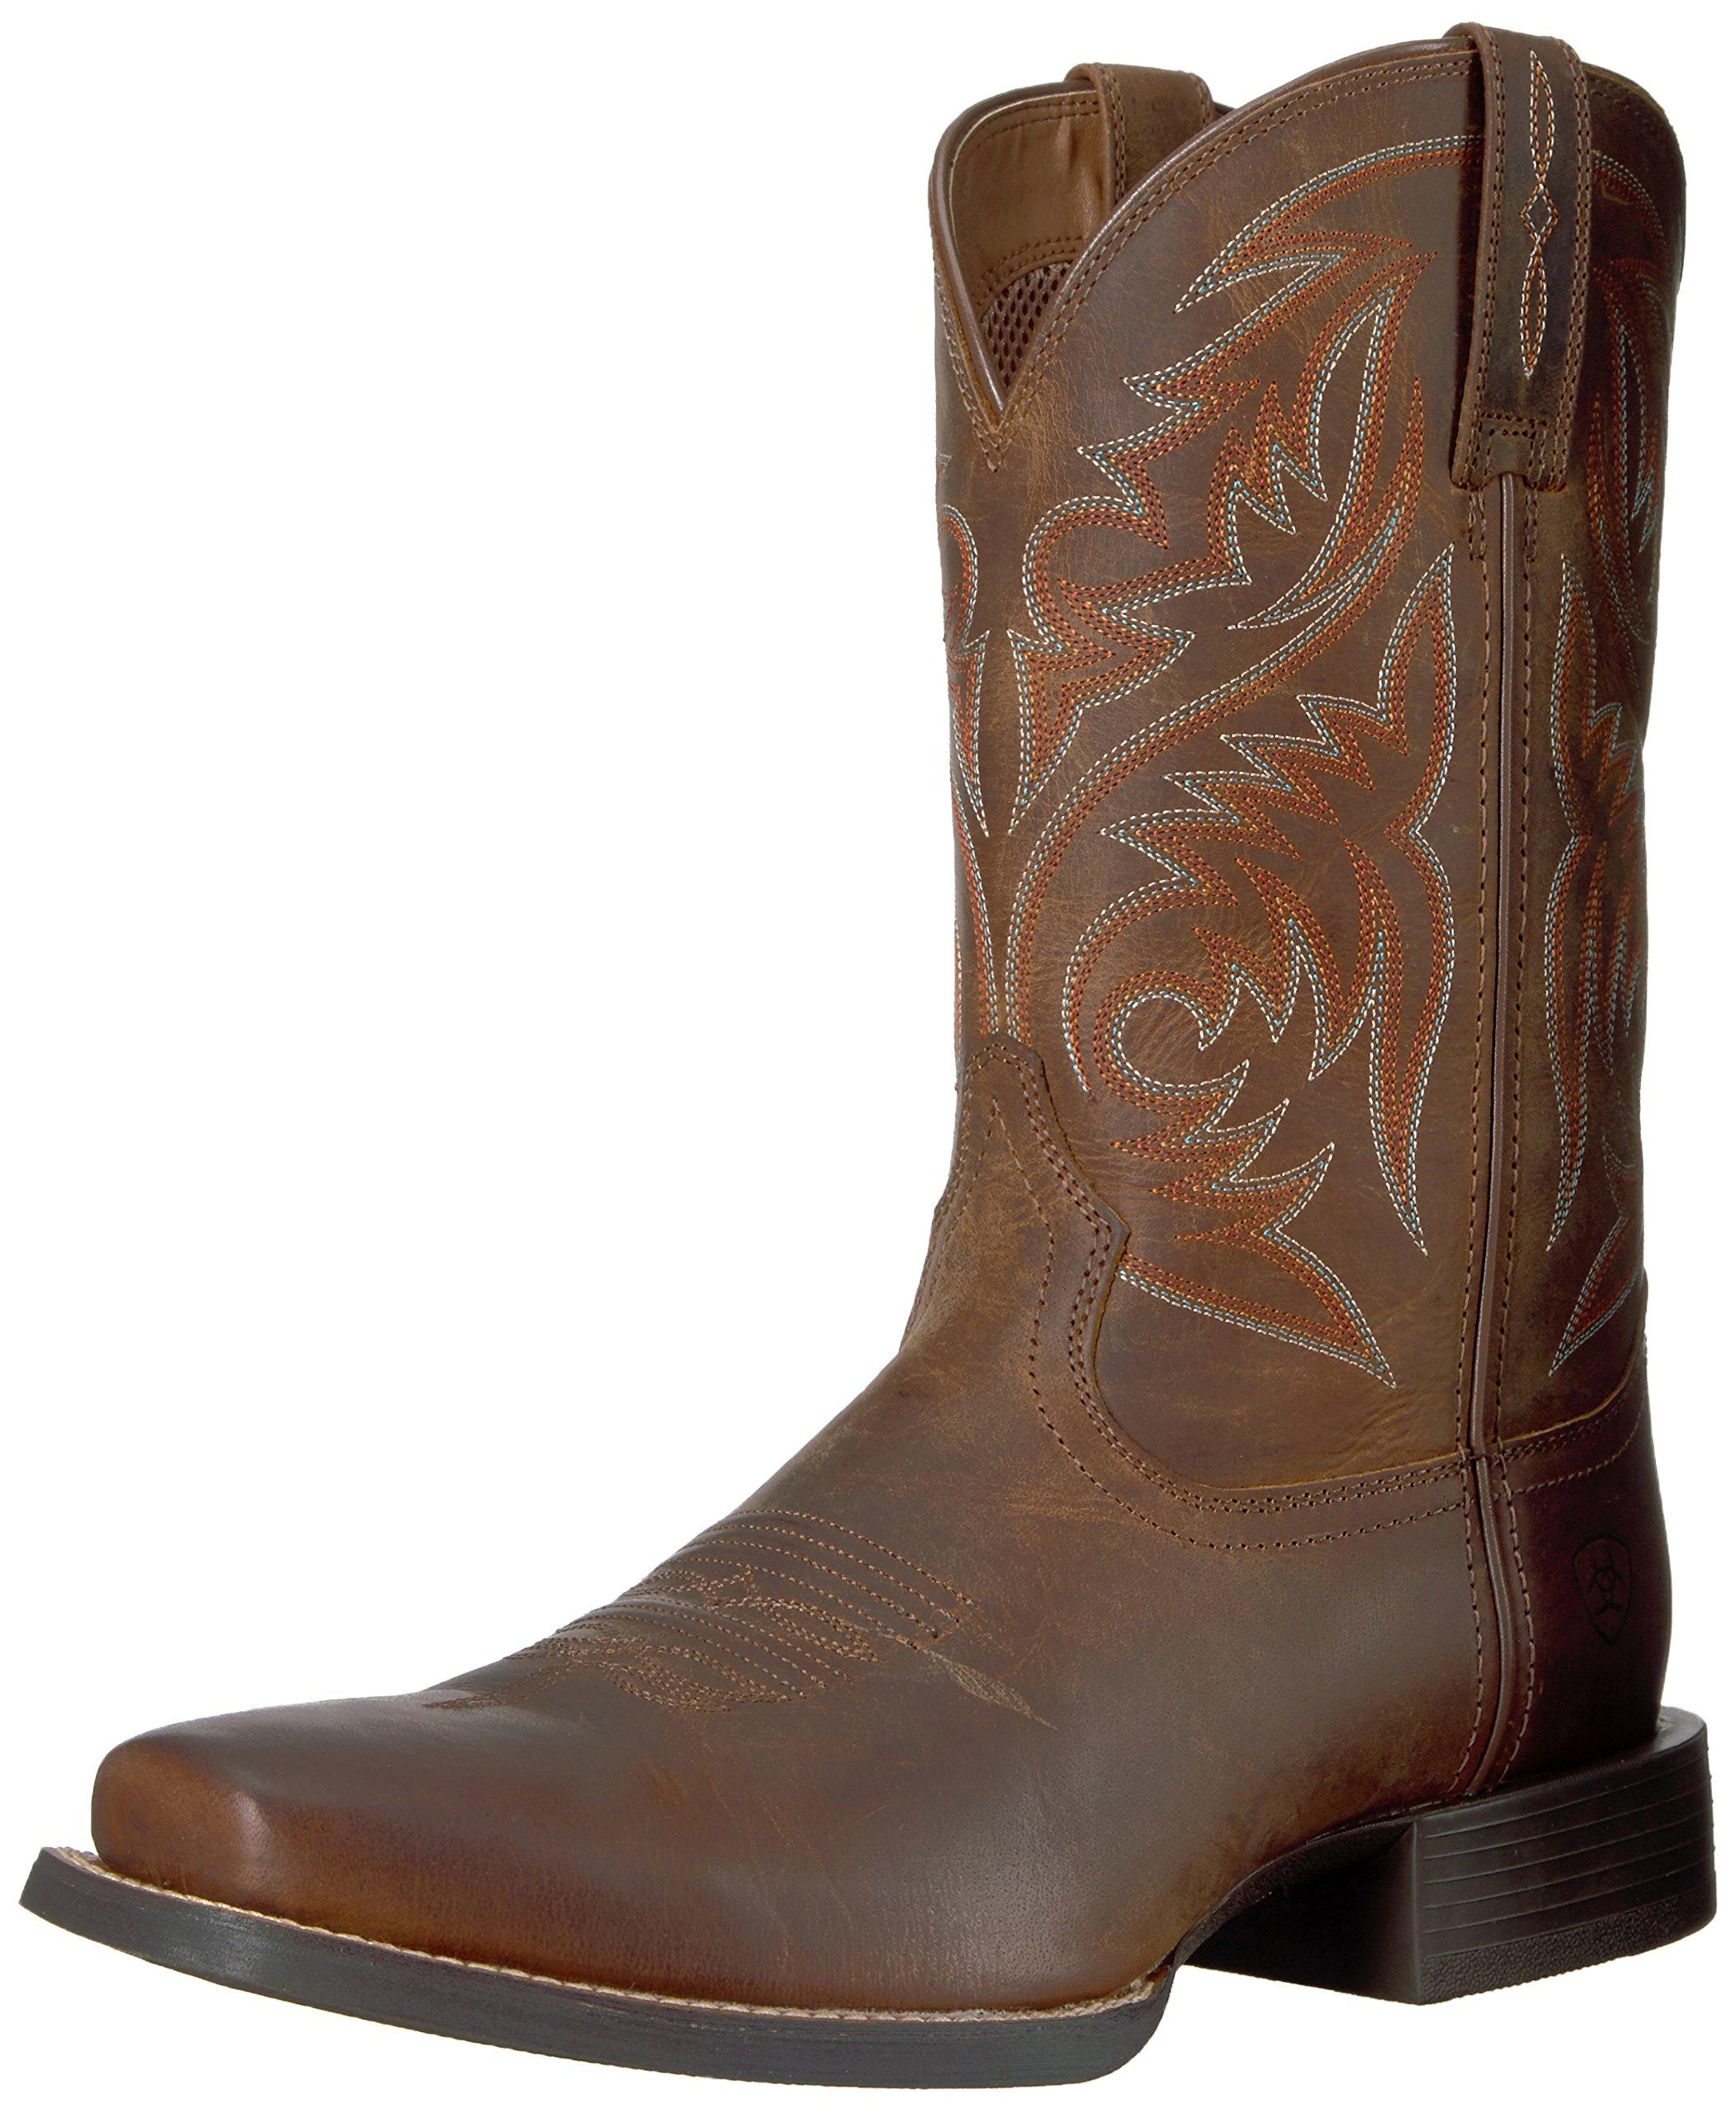 Ariat Men's Sport Herdsman Work Boot, Powder Brown, 8.5 D US